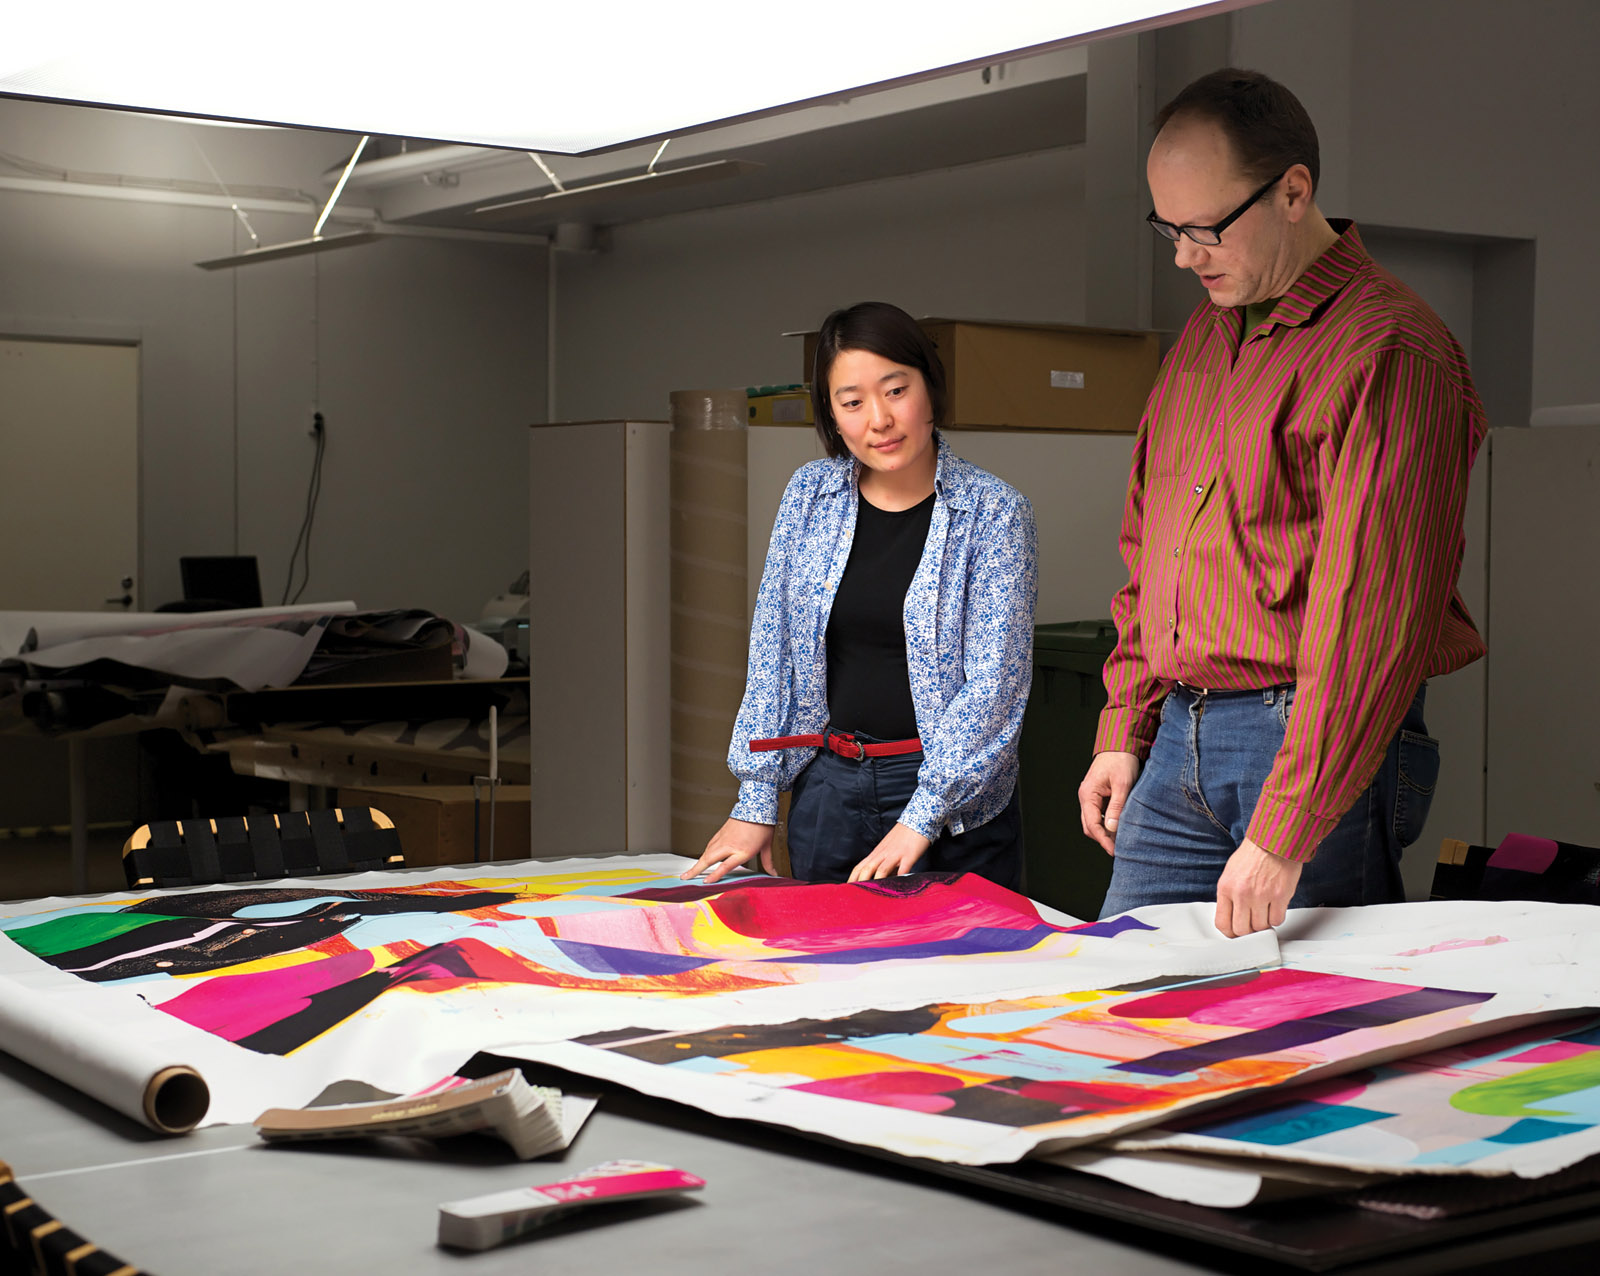 Design team comparing proofs at the Marimekko factory